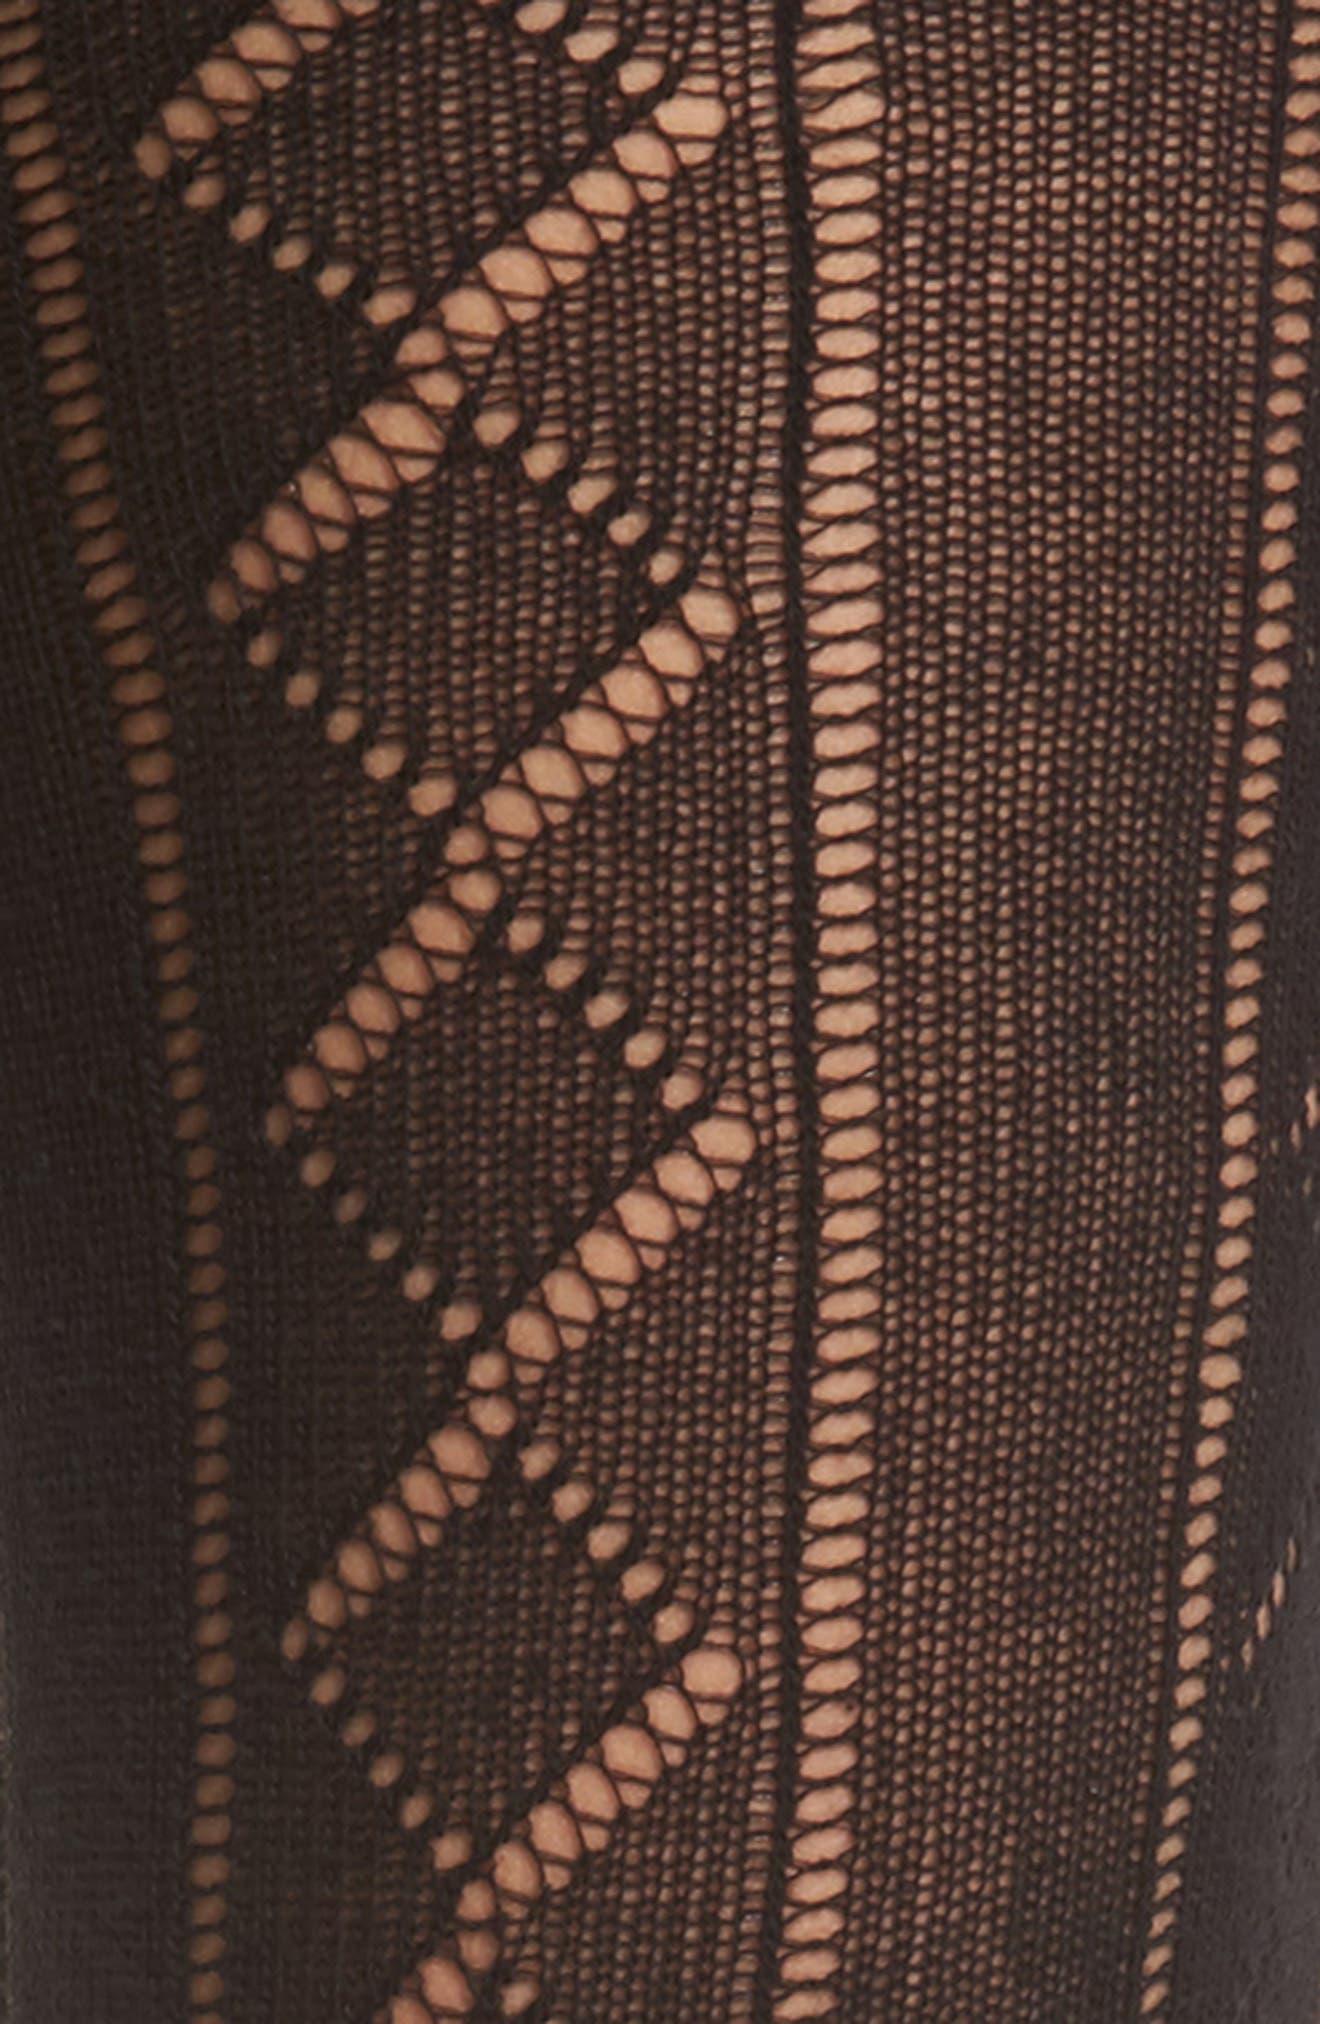 Losange Knit Tights,                             Alternate thumbnail 2, color,                             001